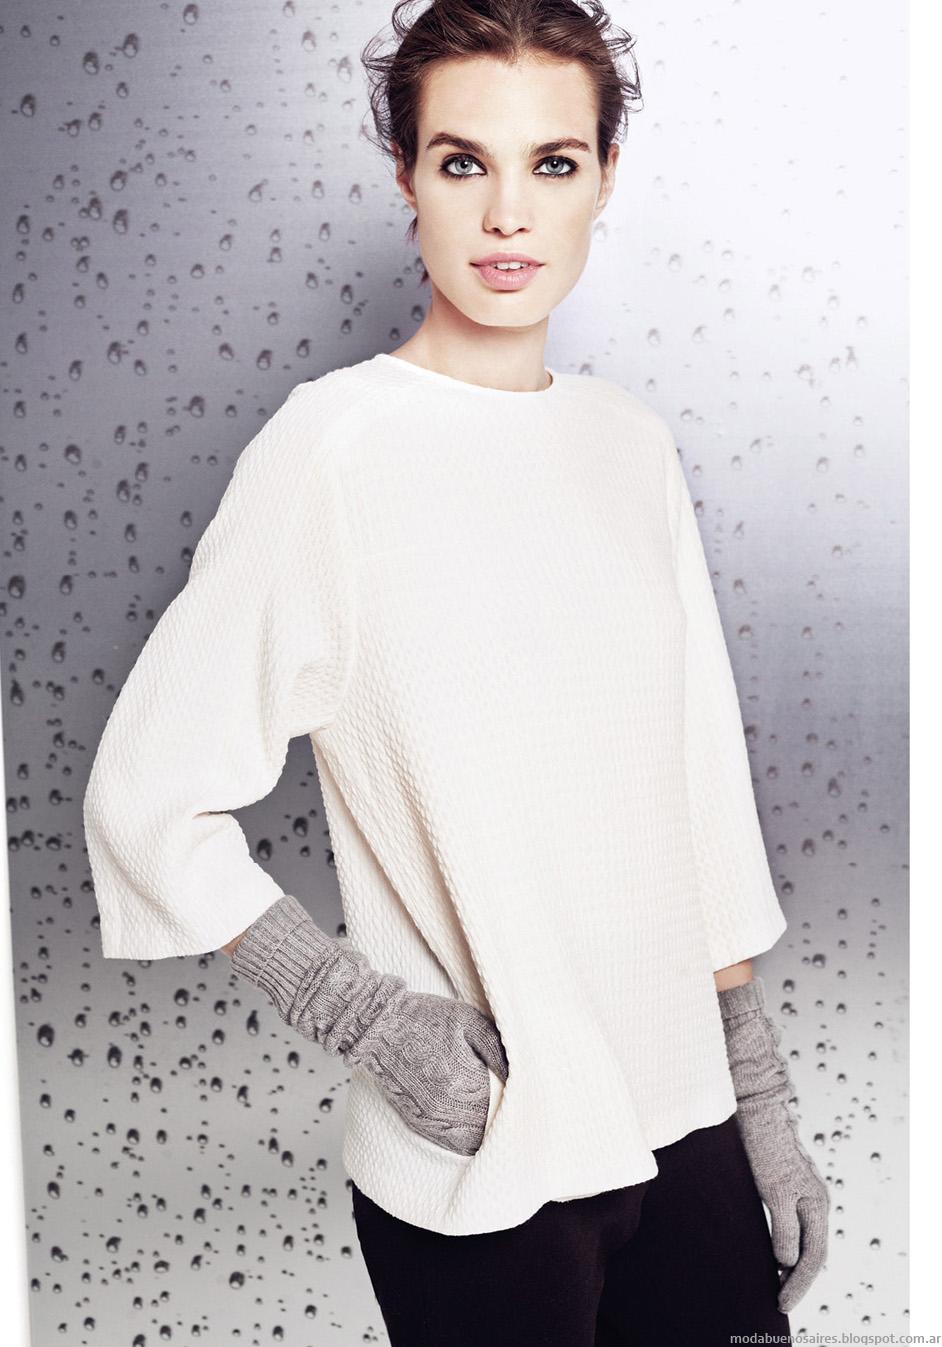 Ropa de moda invierno 2014 Graciela Naum.